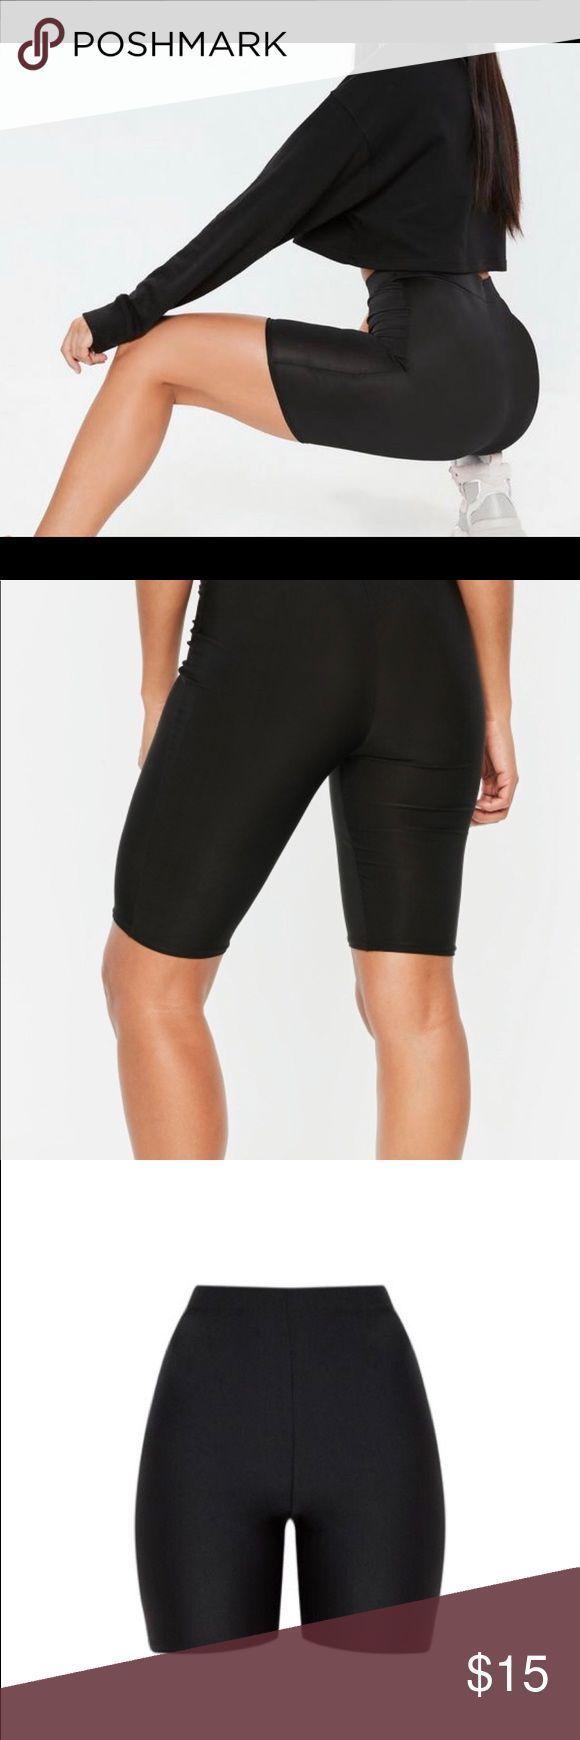 Disco biker shorts black Black disco biker shorts, between mid thigh and knee le...  #biker #black #Disco #knee #Mid #Shorts #thigh